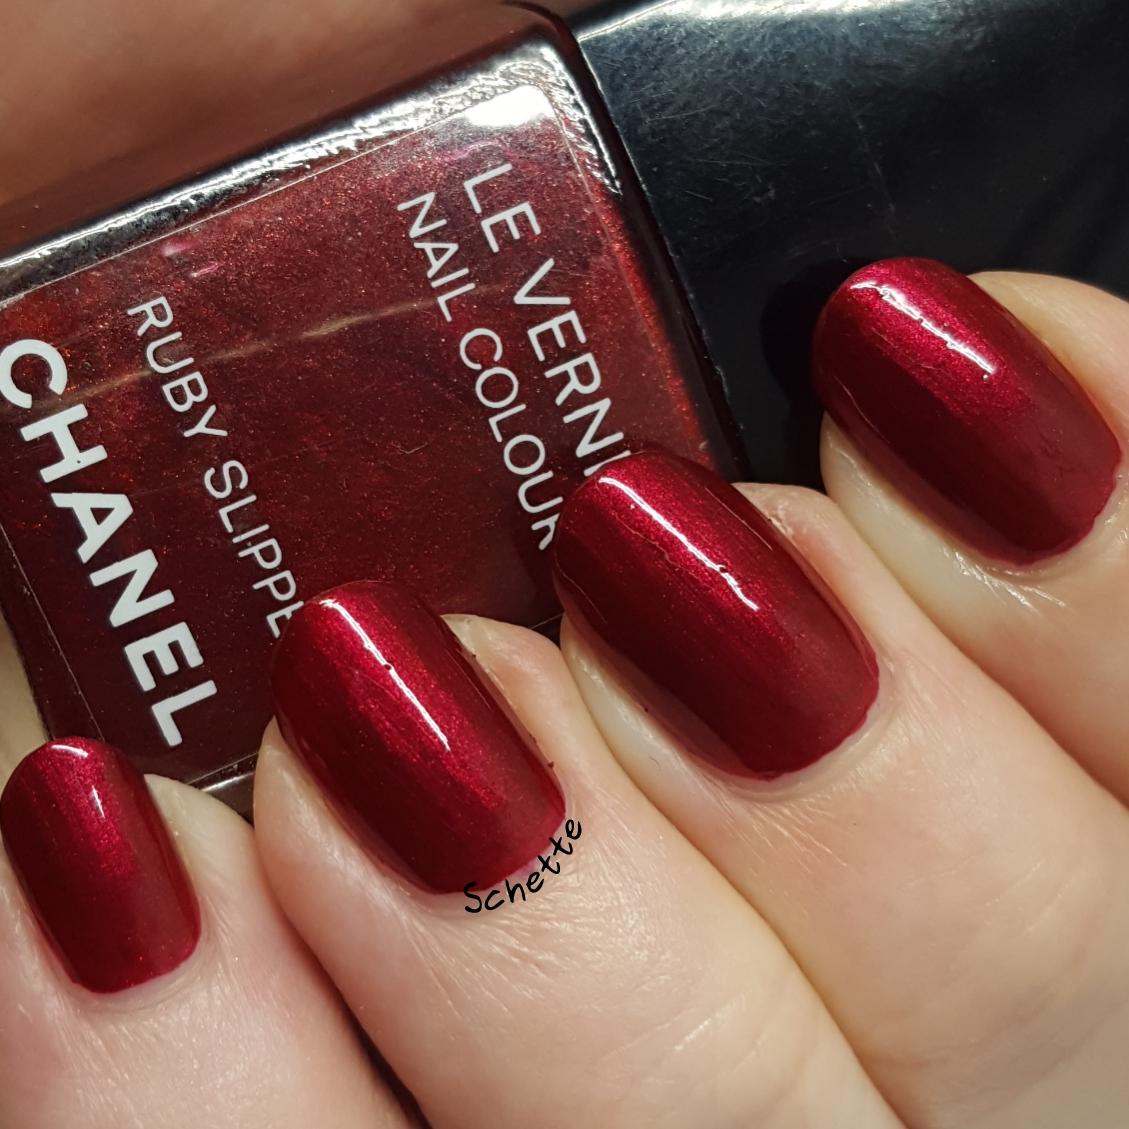 Chanel - Ruby Slipper